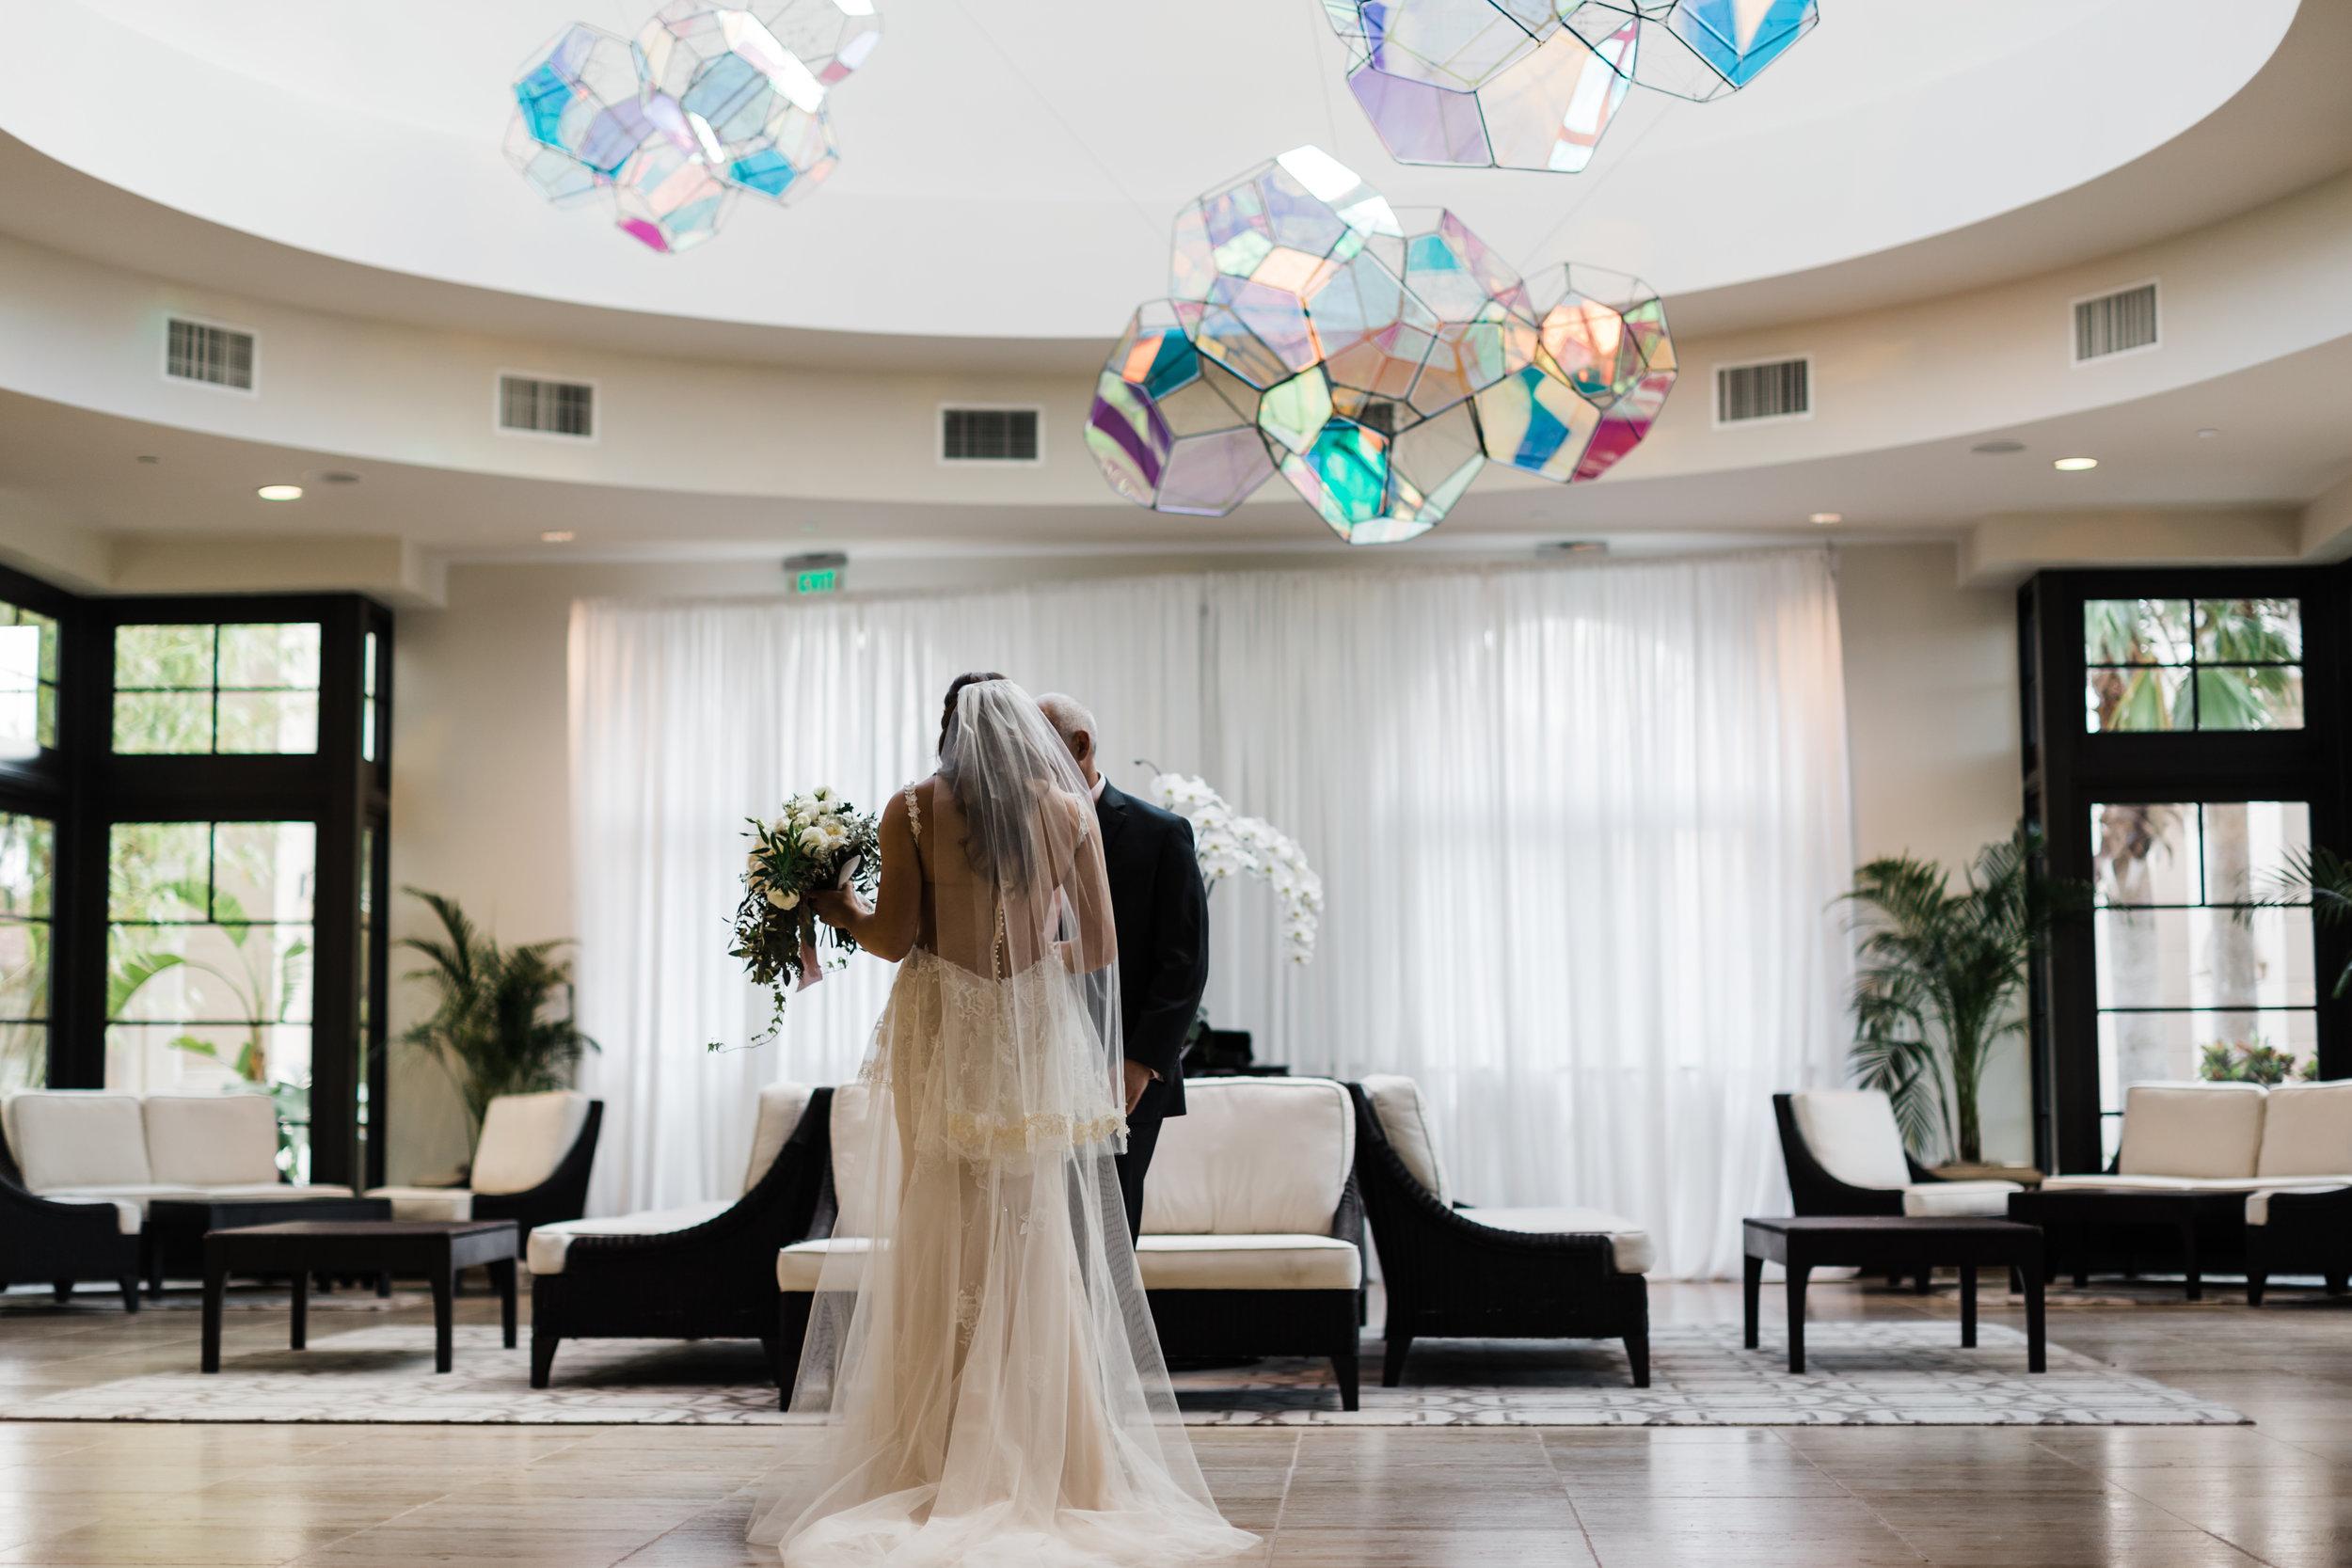 2017.10.15 Steffi and Elliott Simmonds Casa Feliz Wedding (188 of 969).jpg